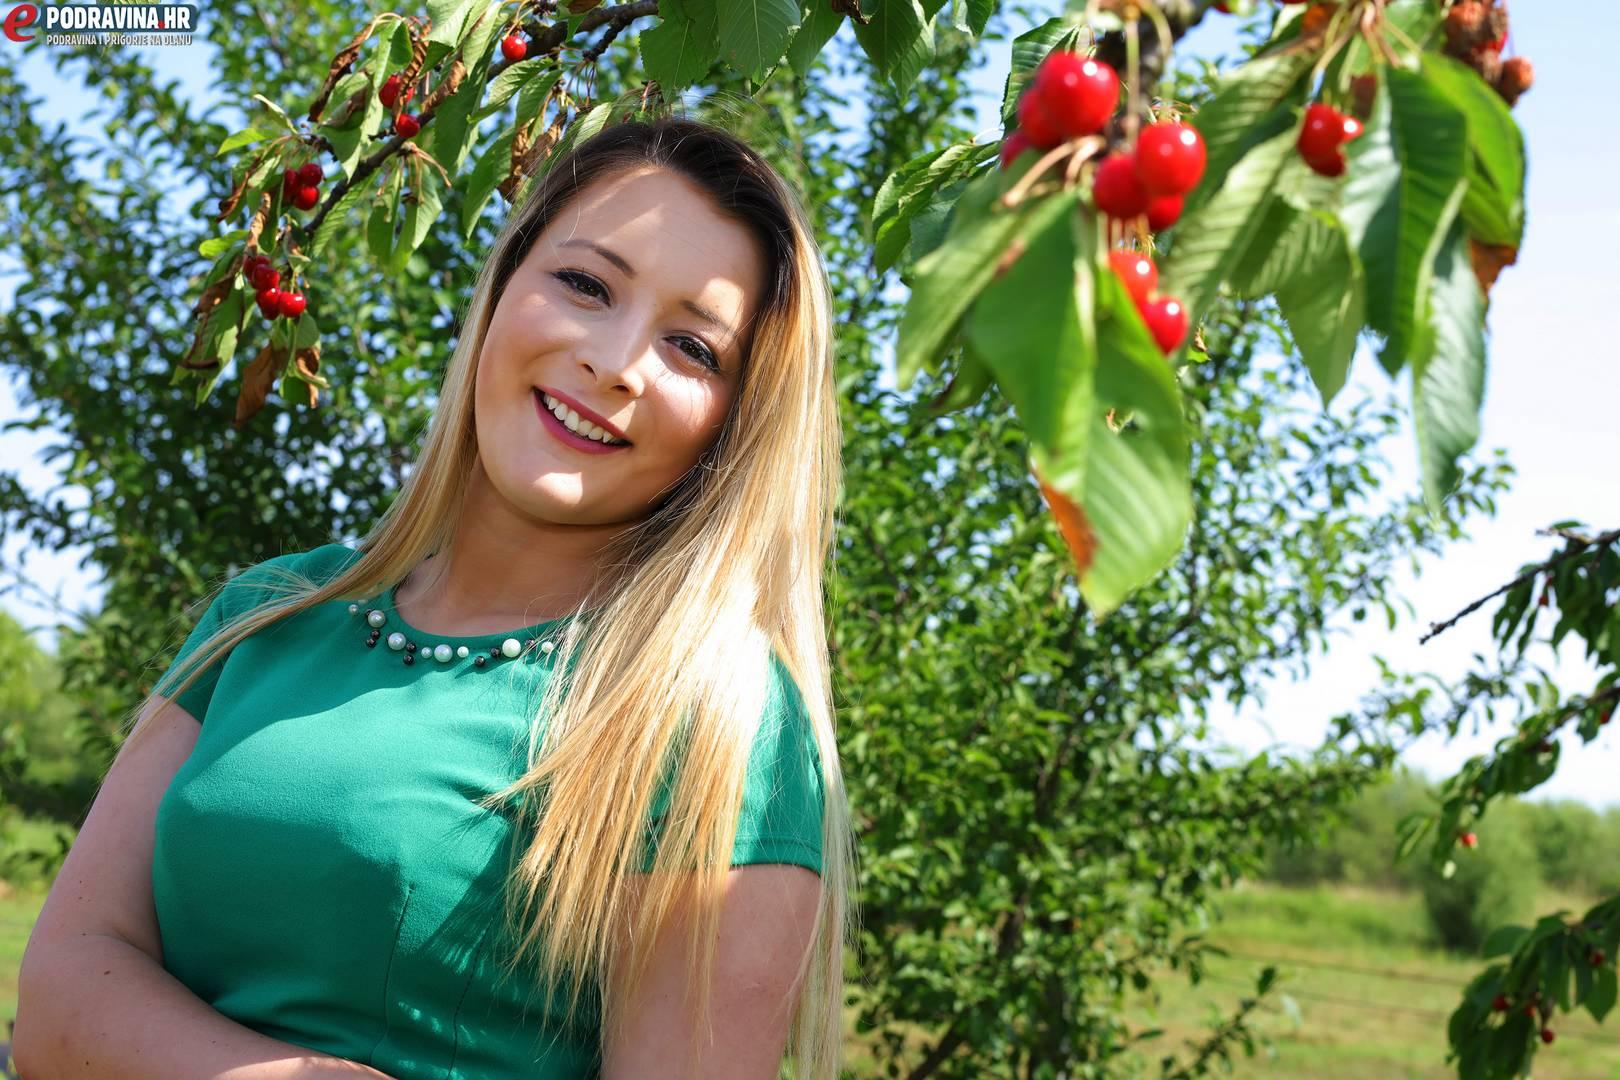 Natalija Slišković